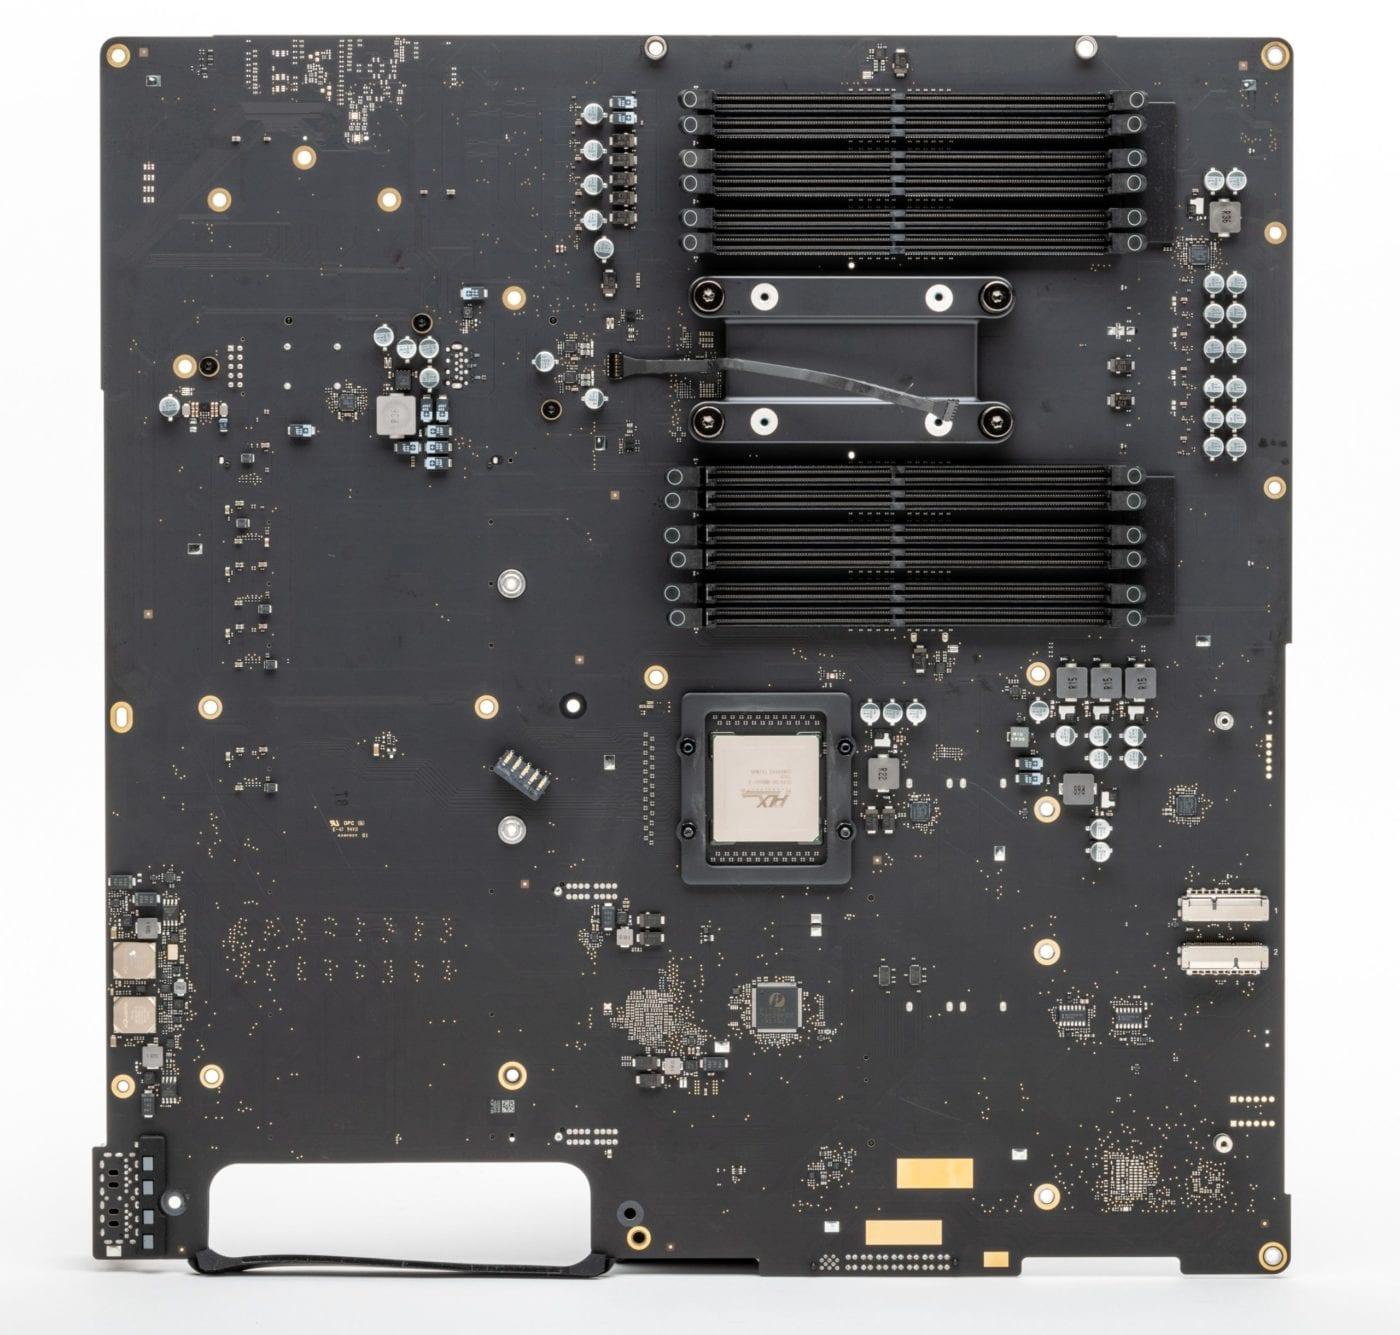 2019 Mac Pro – Logic board side with slots for RAM